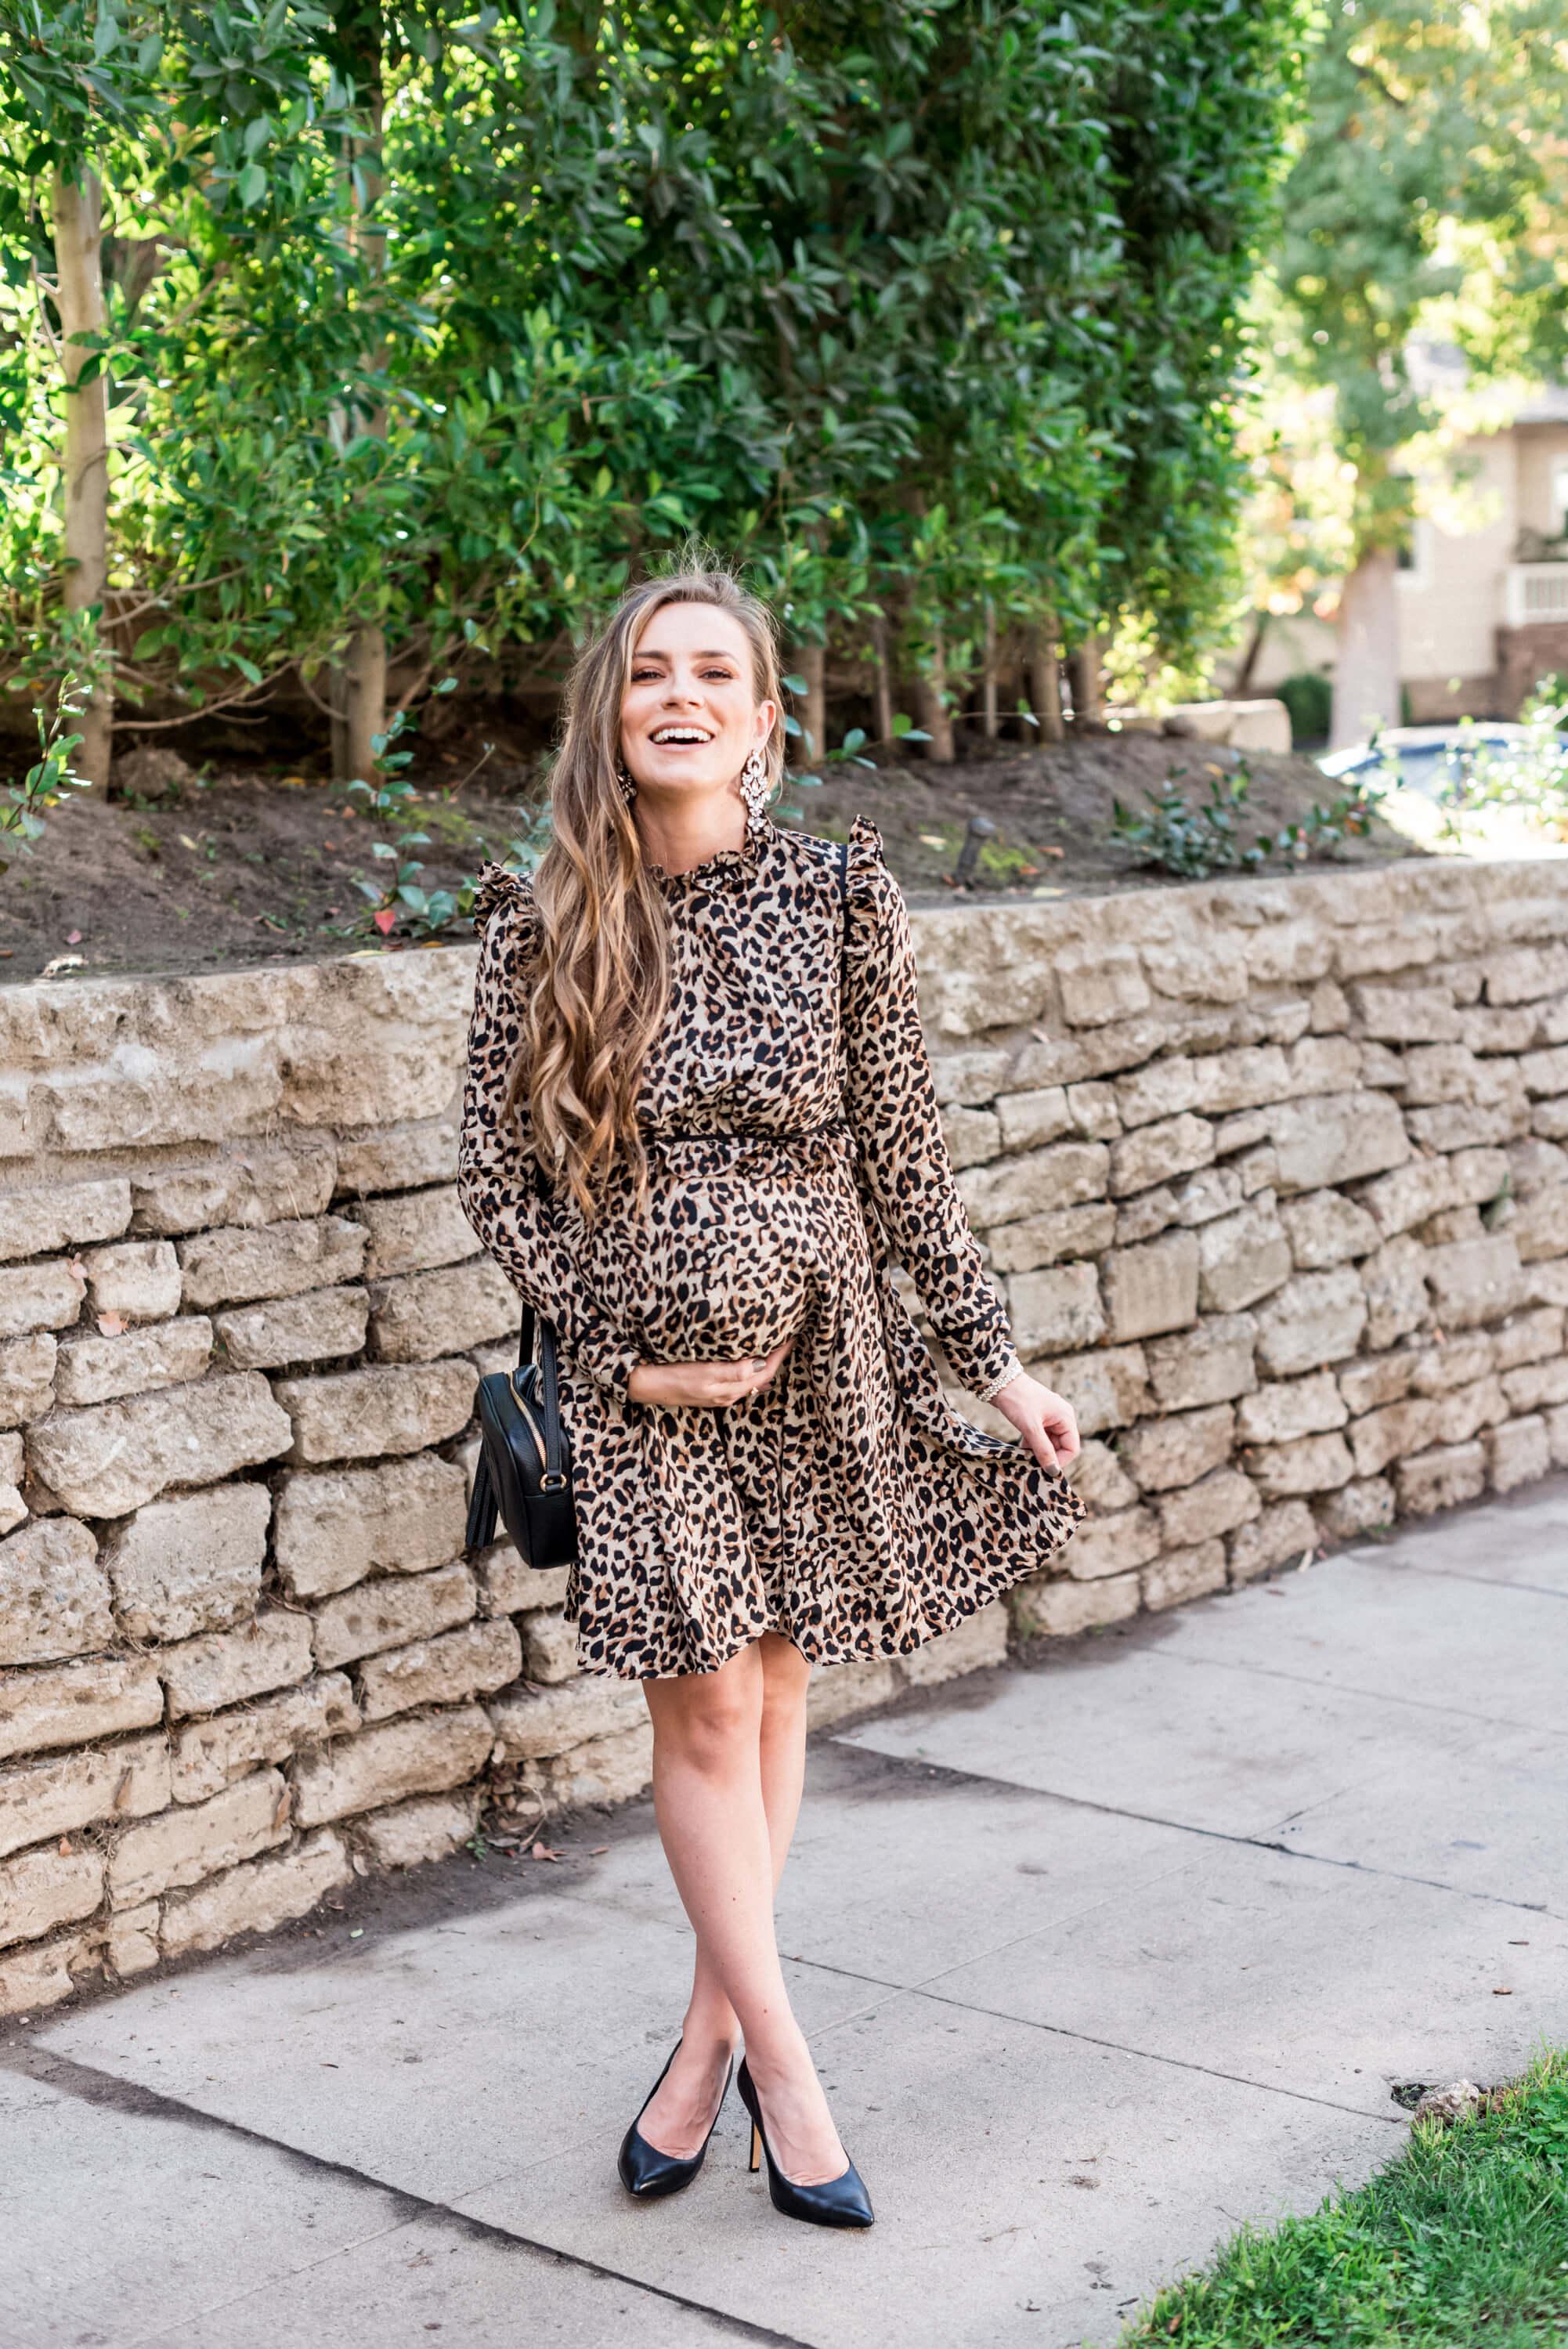 angela Lanter Hello Gorgeous maternity style leopard print dress ASOS